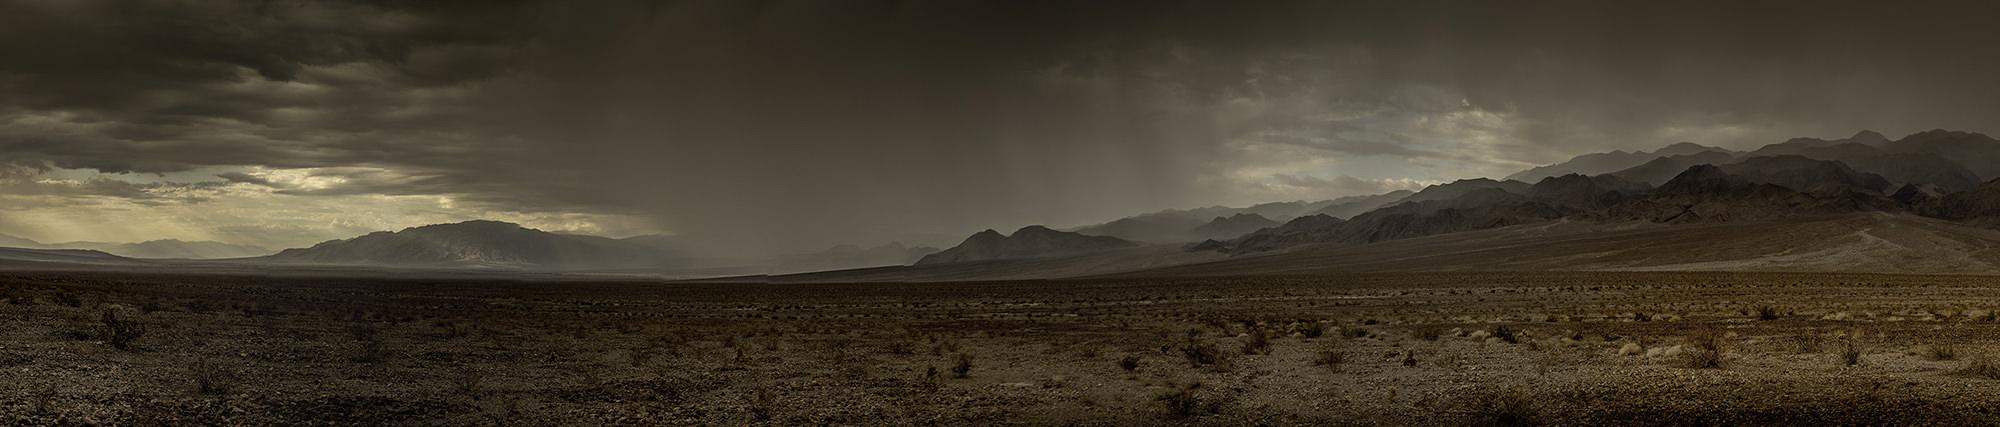 Rain in Death Valley National Park